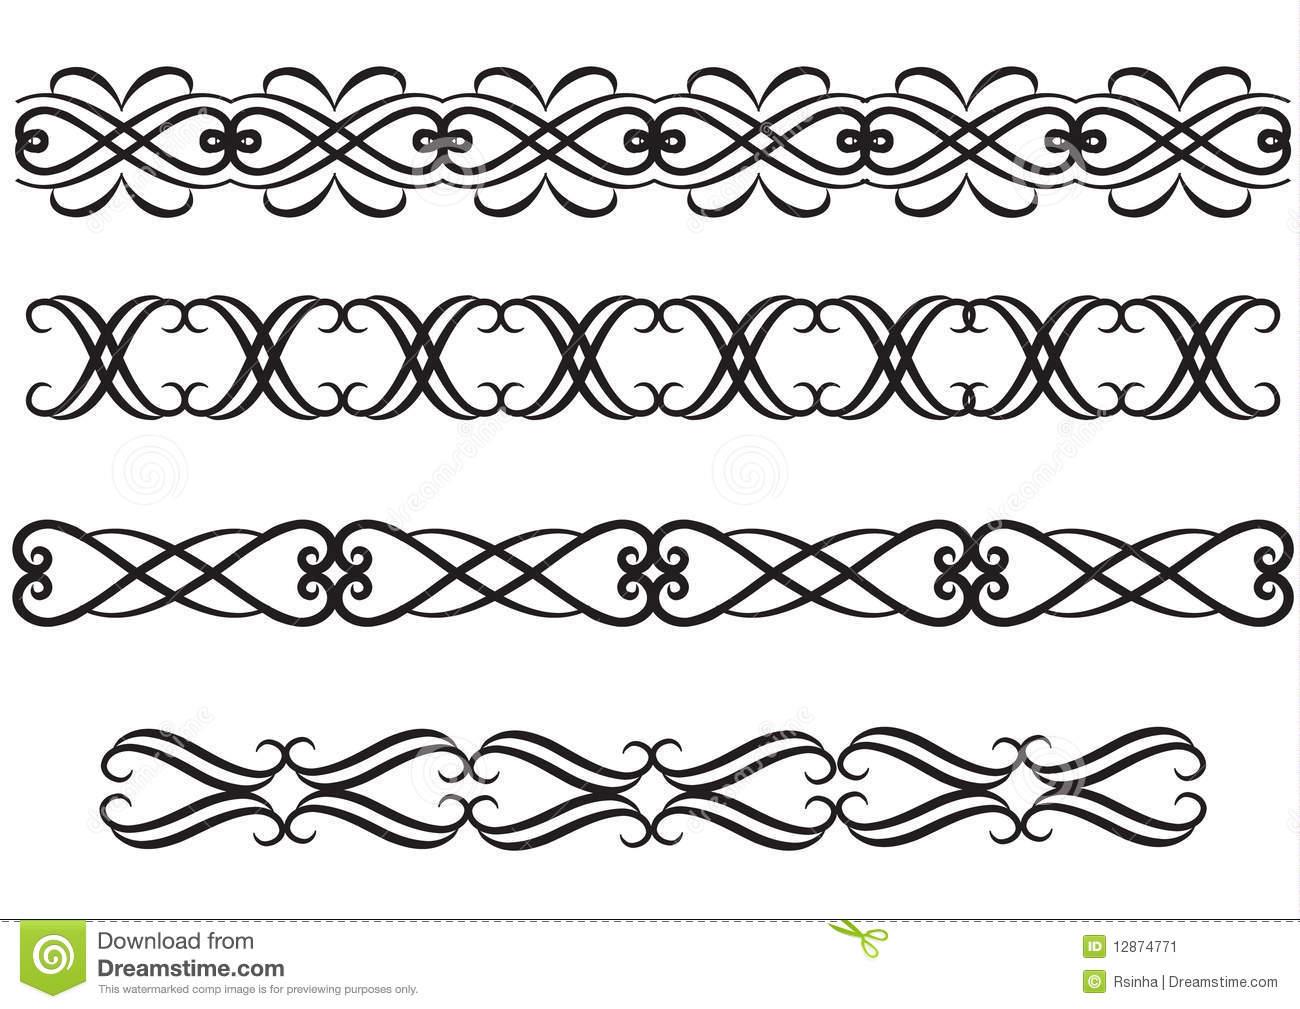 Elegant lines - photo#24